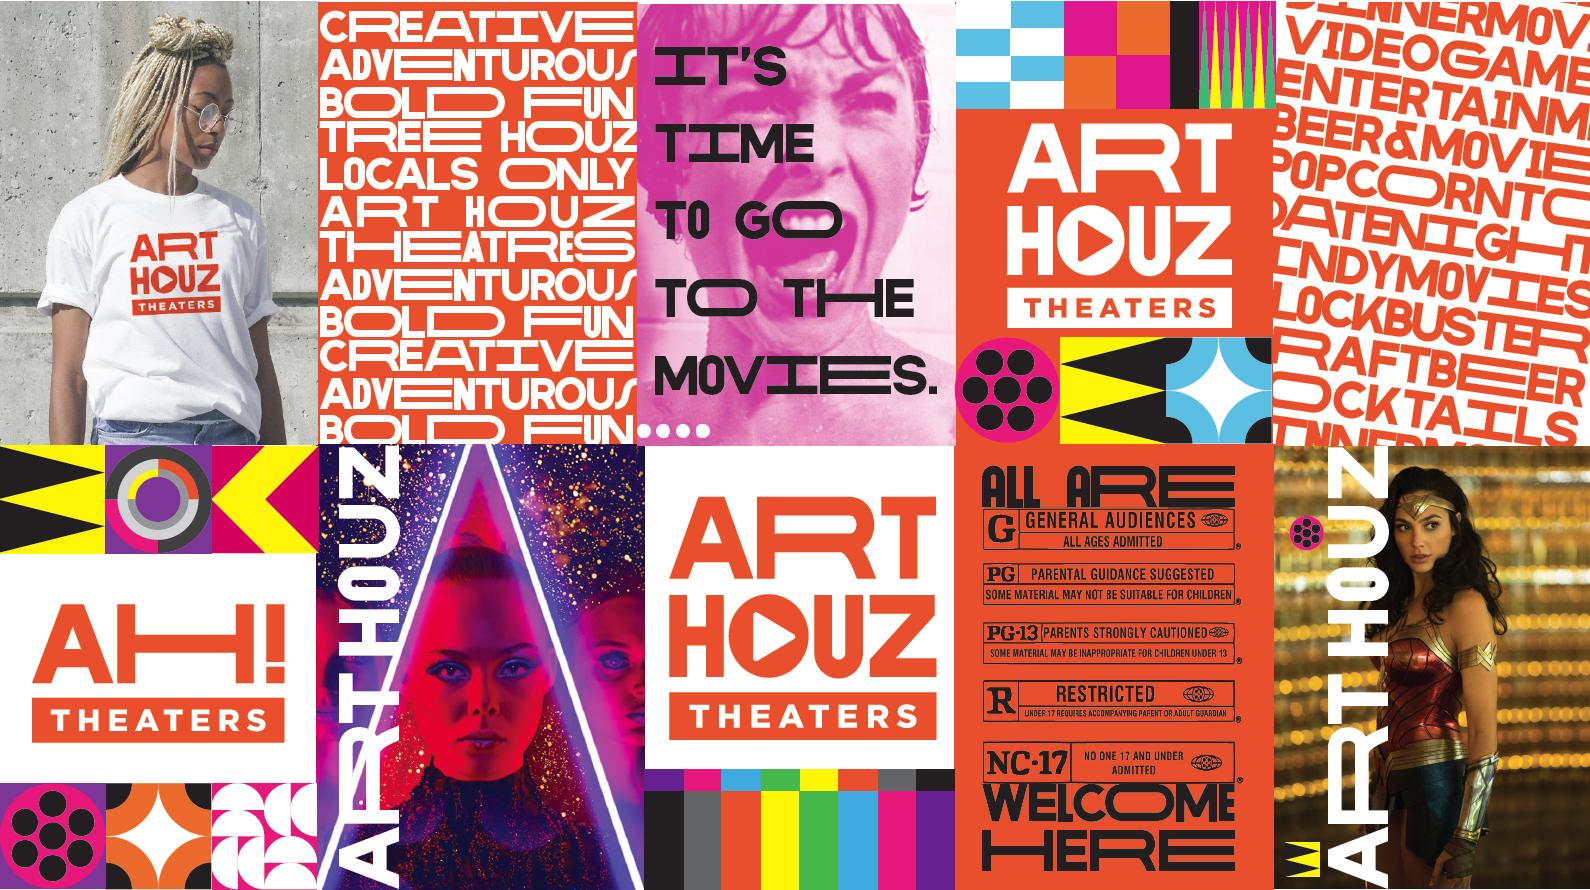 ArtHouz Theaters moodboard